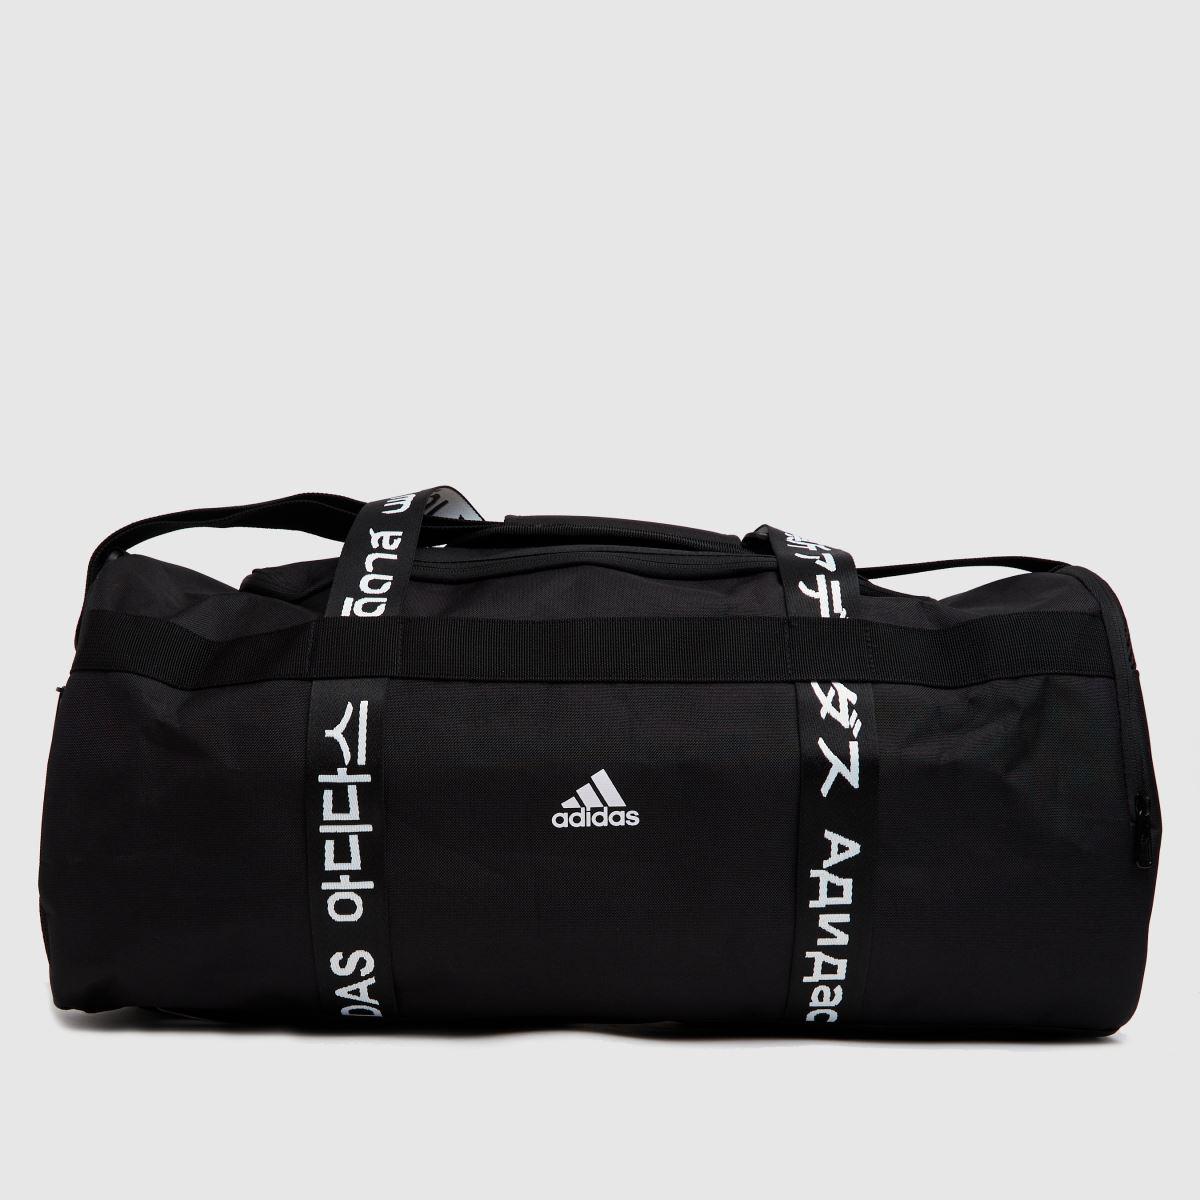 Adidas Black & White Athletics Duffle Bag